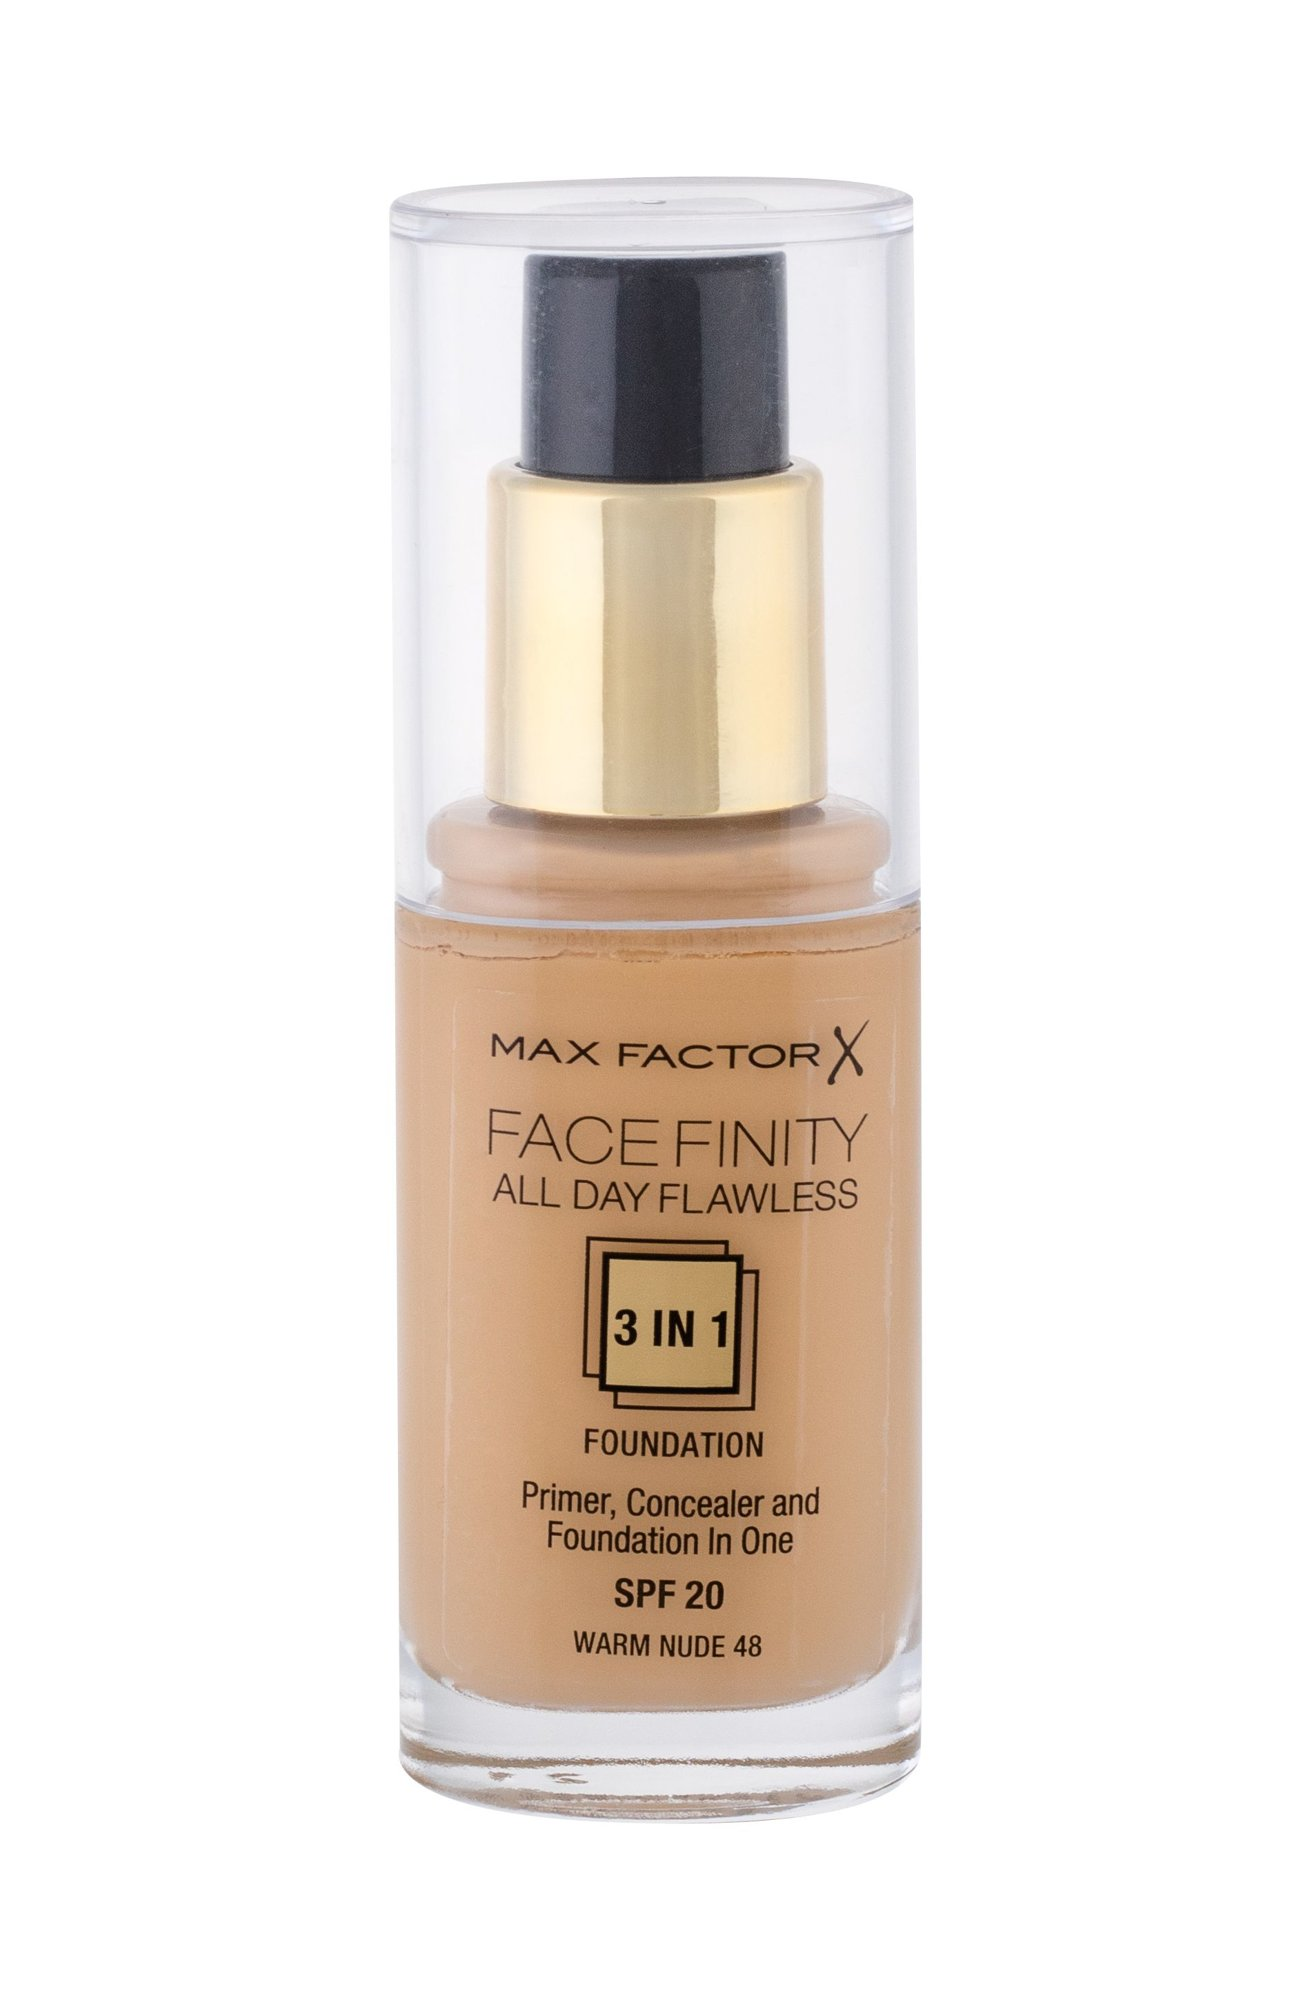 Max Factor Facefinity Makeup 30ml 48 Warm Nude